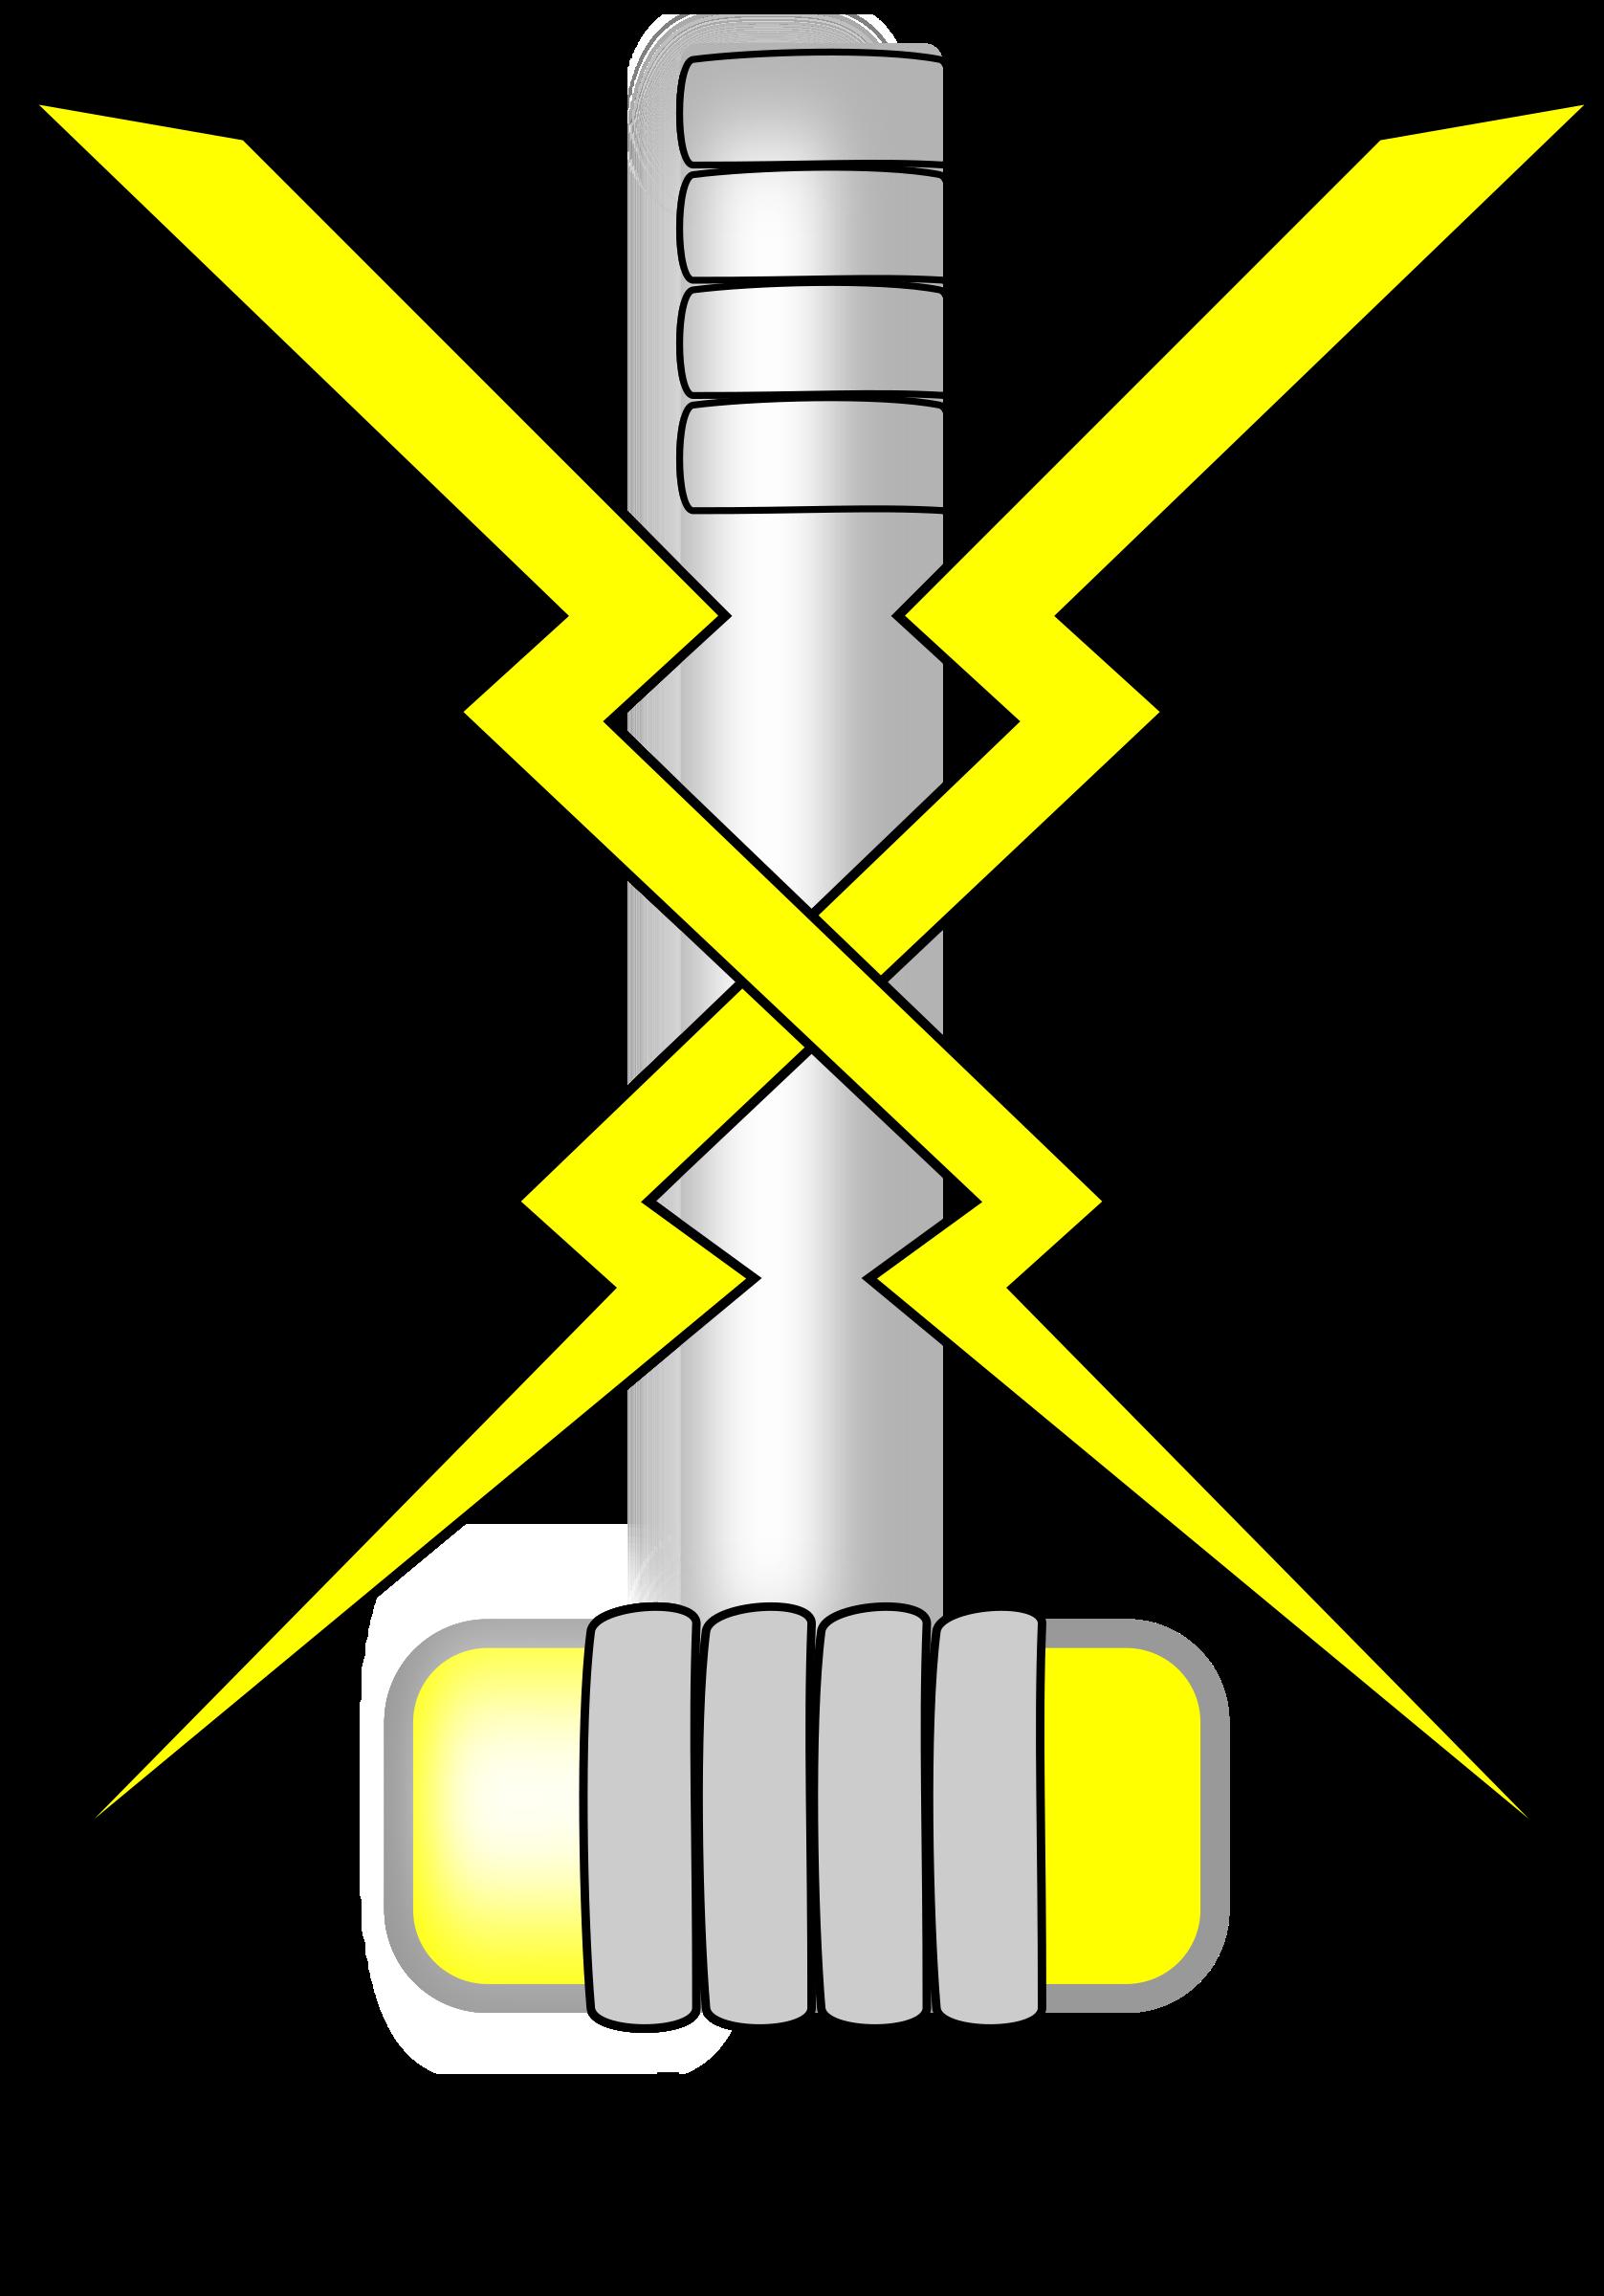 clip free download Mj lnir s big. Thor clipart thor's hammer